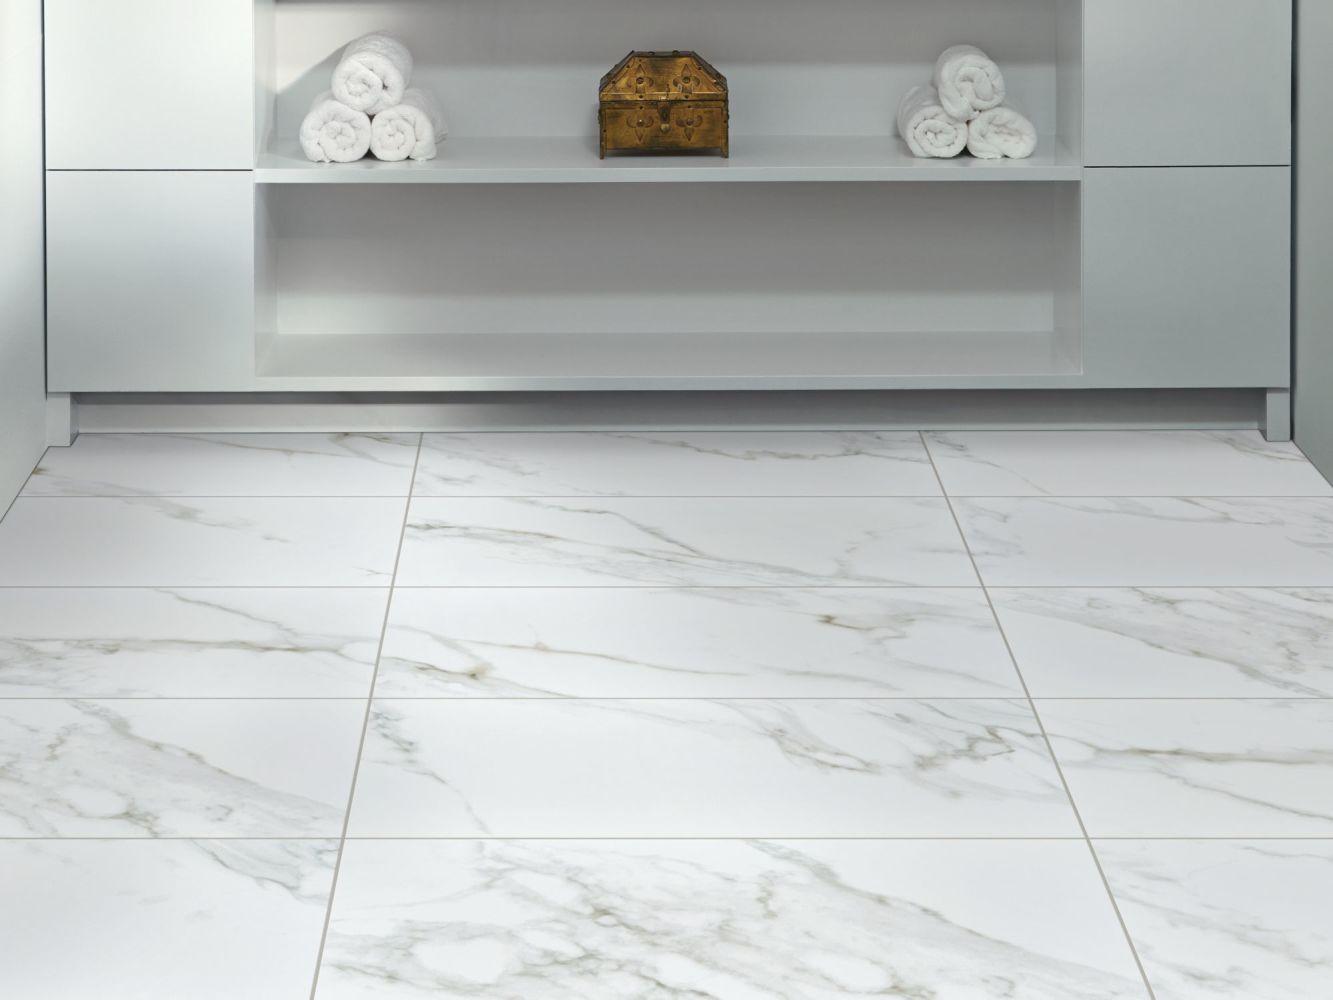 Shaw Floors Home Fn Gold Ceramic Infinity 13×13 Calacatta 00120_TG98D